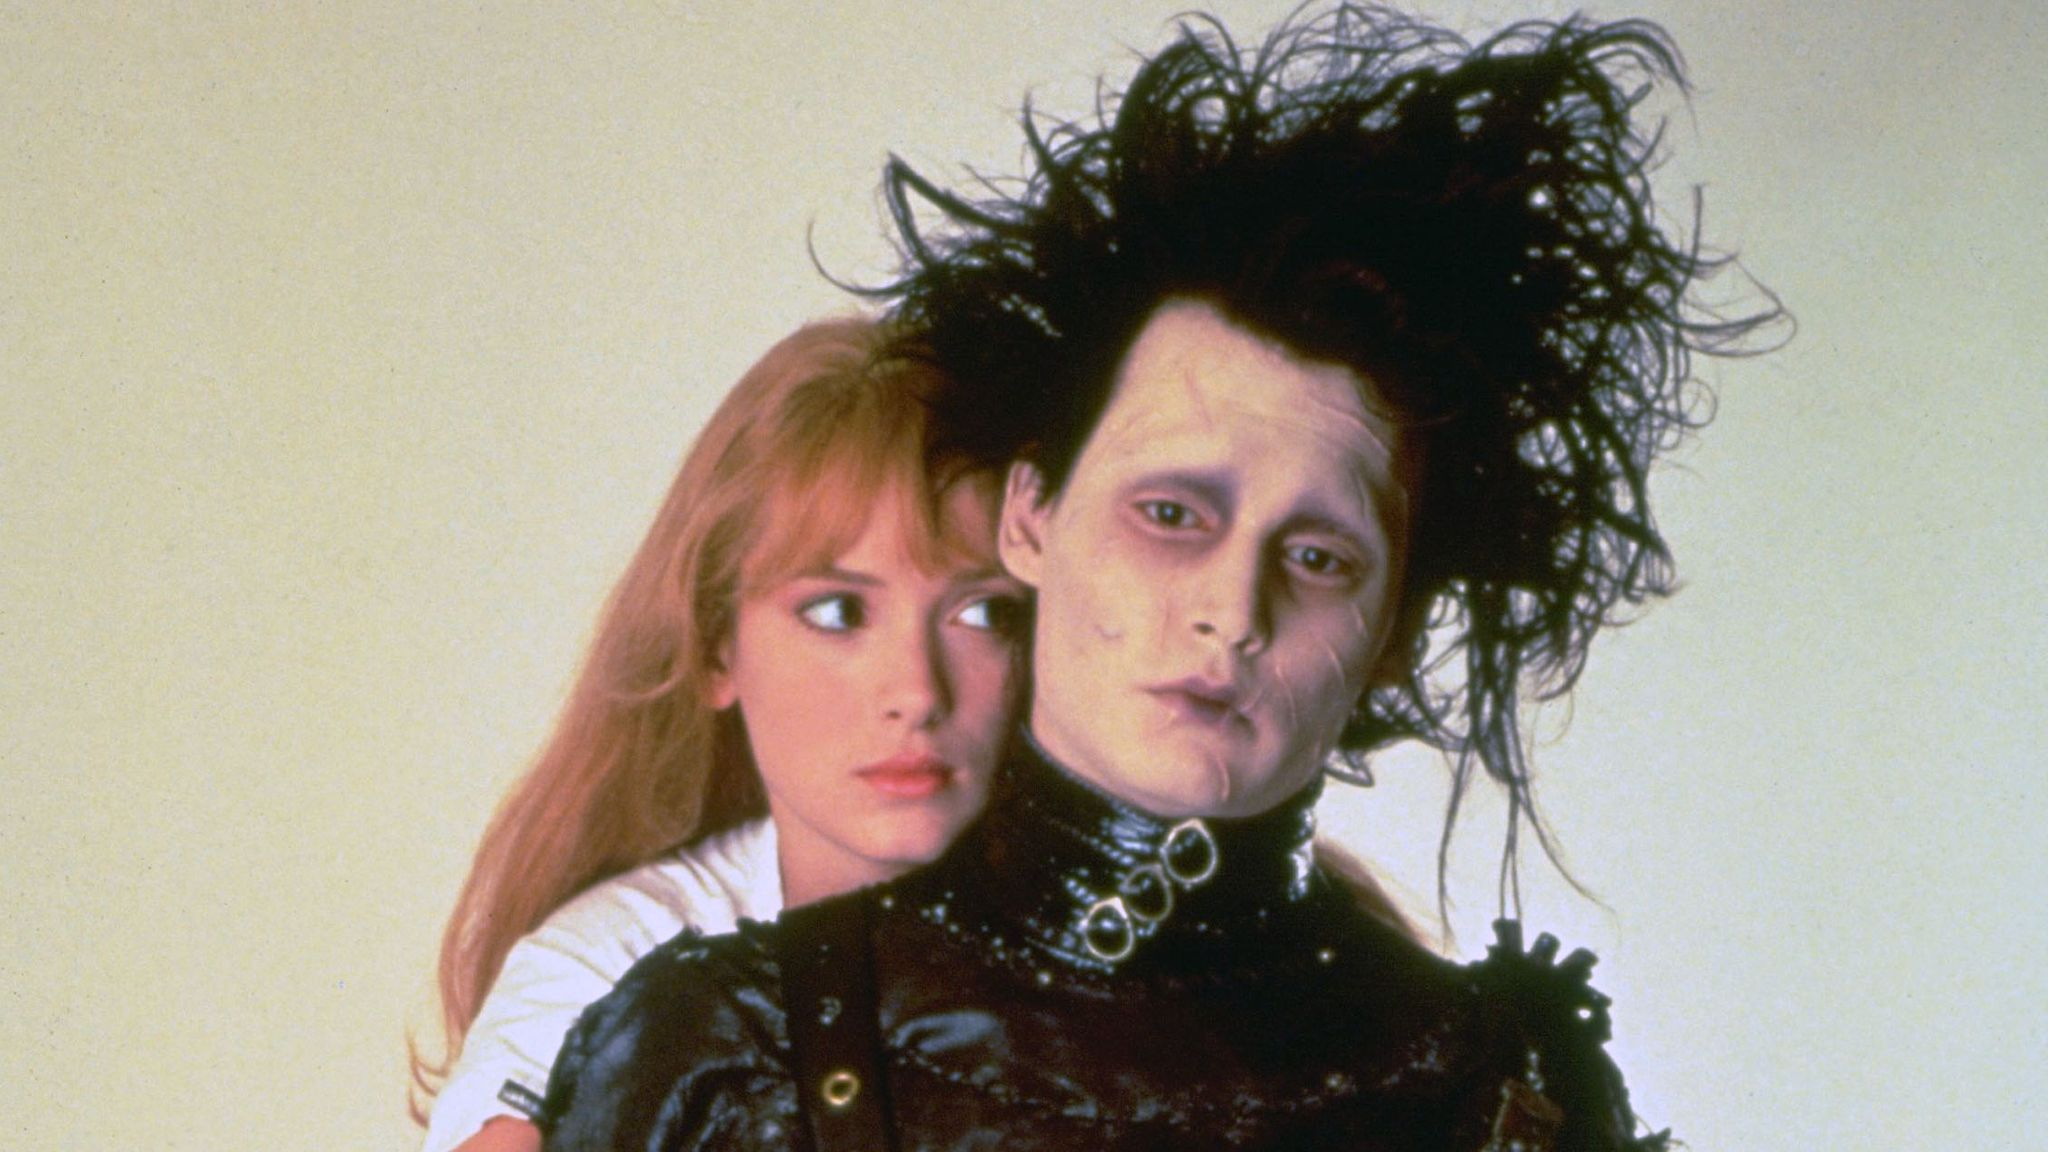 Winona Ryder, Johnny Depp, Edward Scissorhands - 1991. Pic: 20th Century Fox/Kobal/Shutterstock